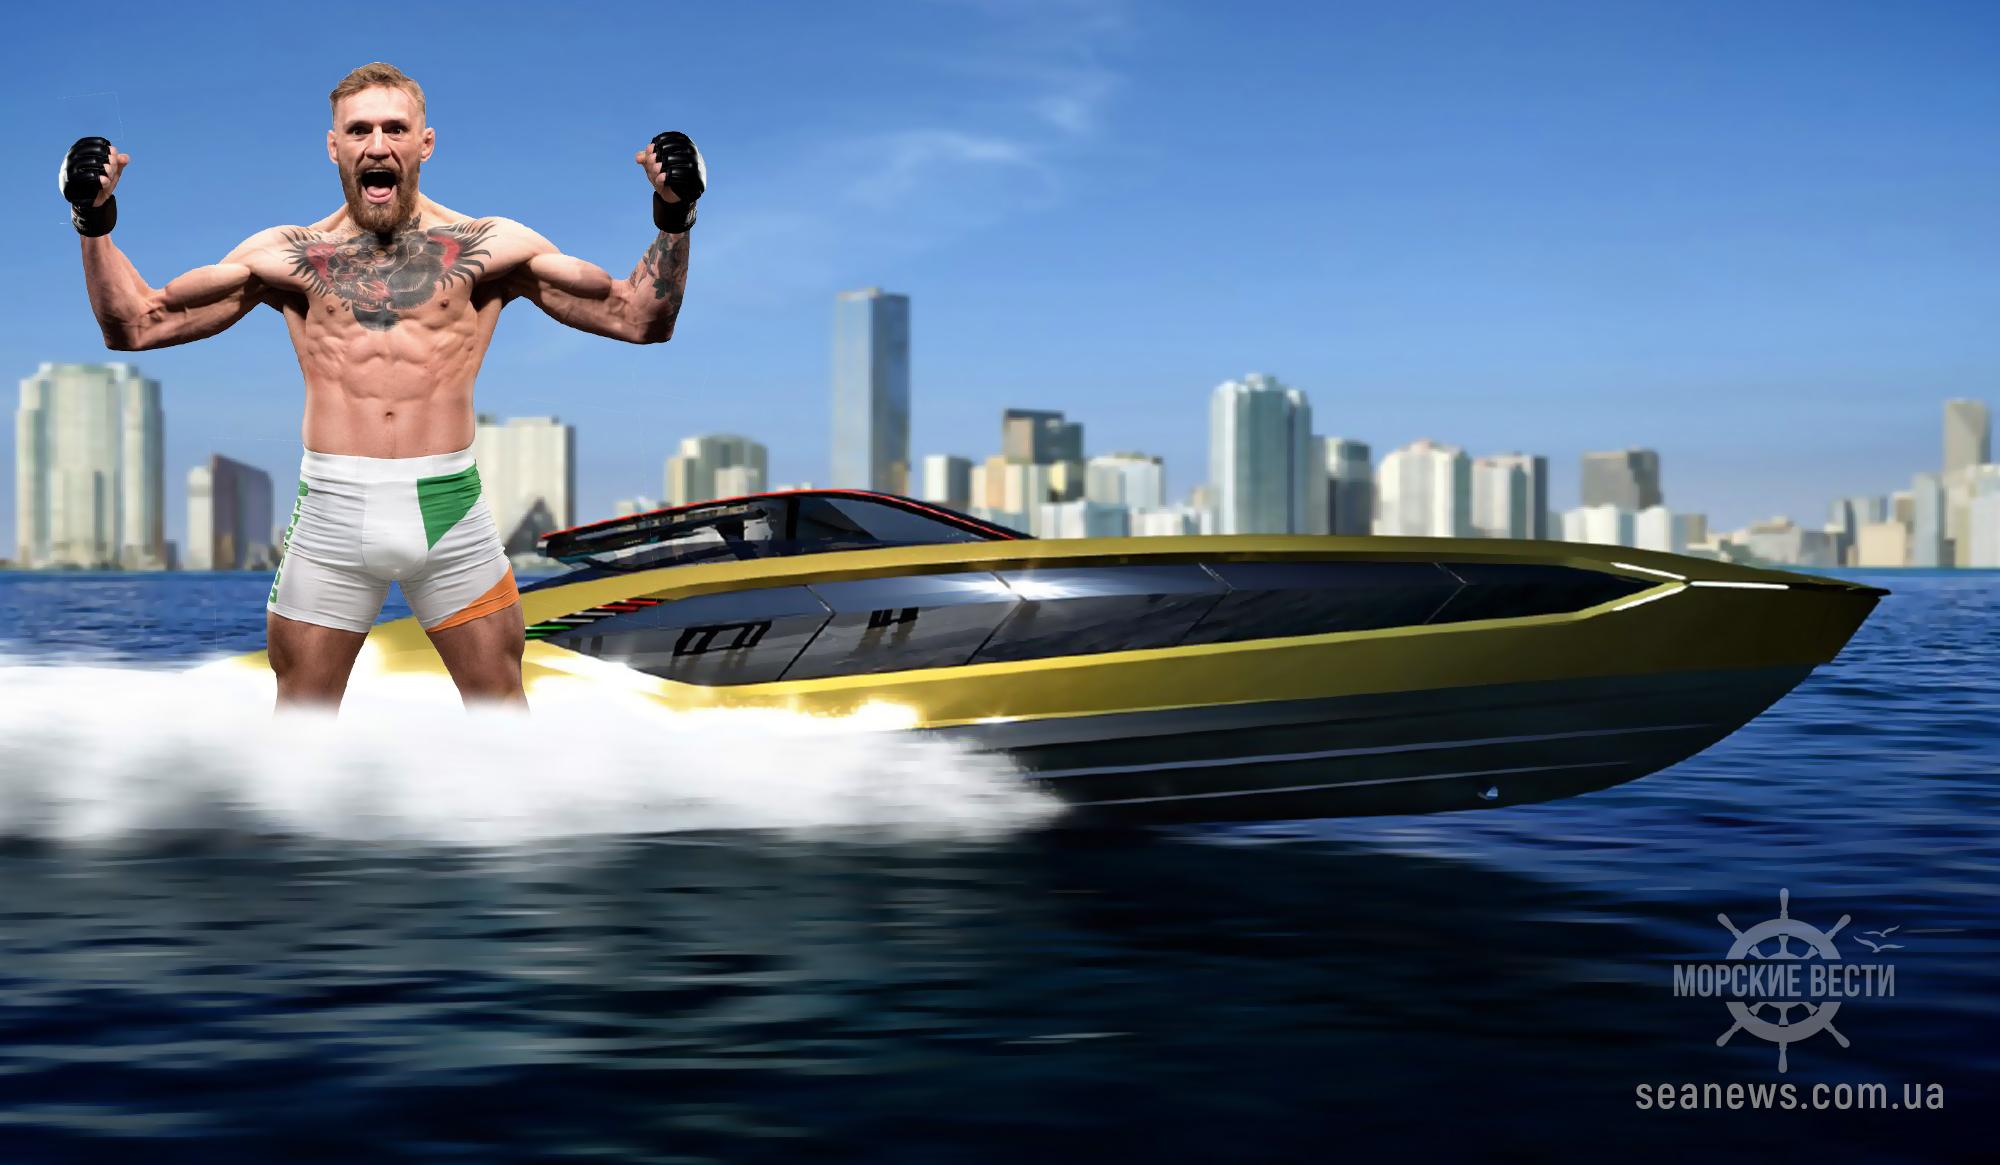 Конор МакГрегор купил эксклюзивную яхту Lamborghini